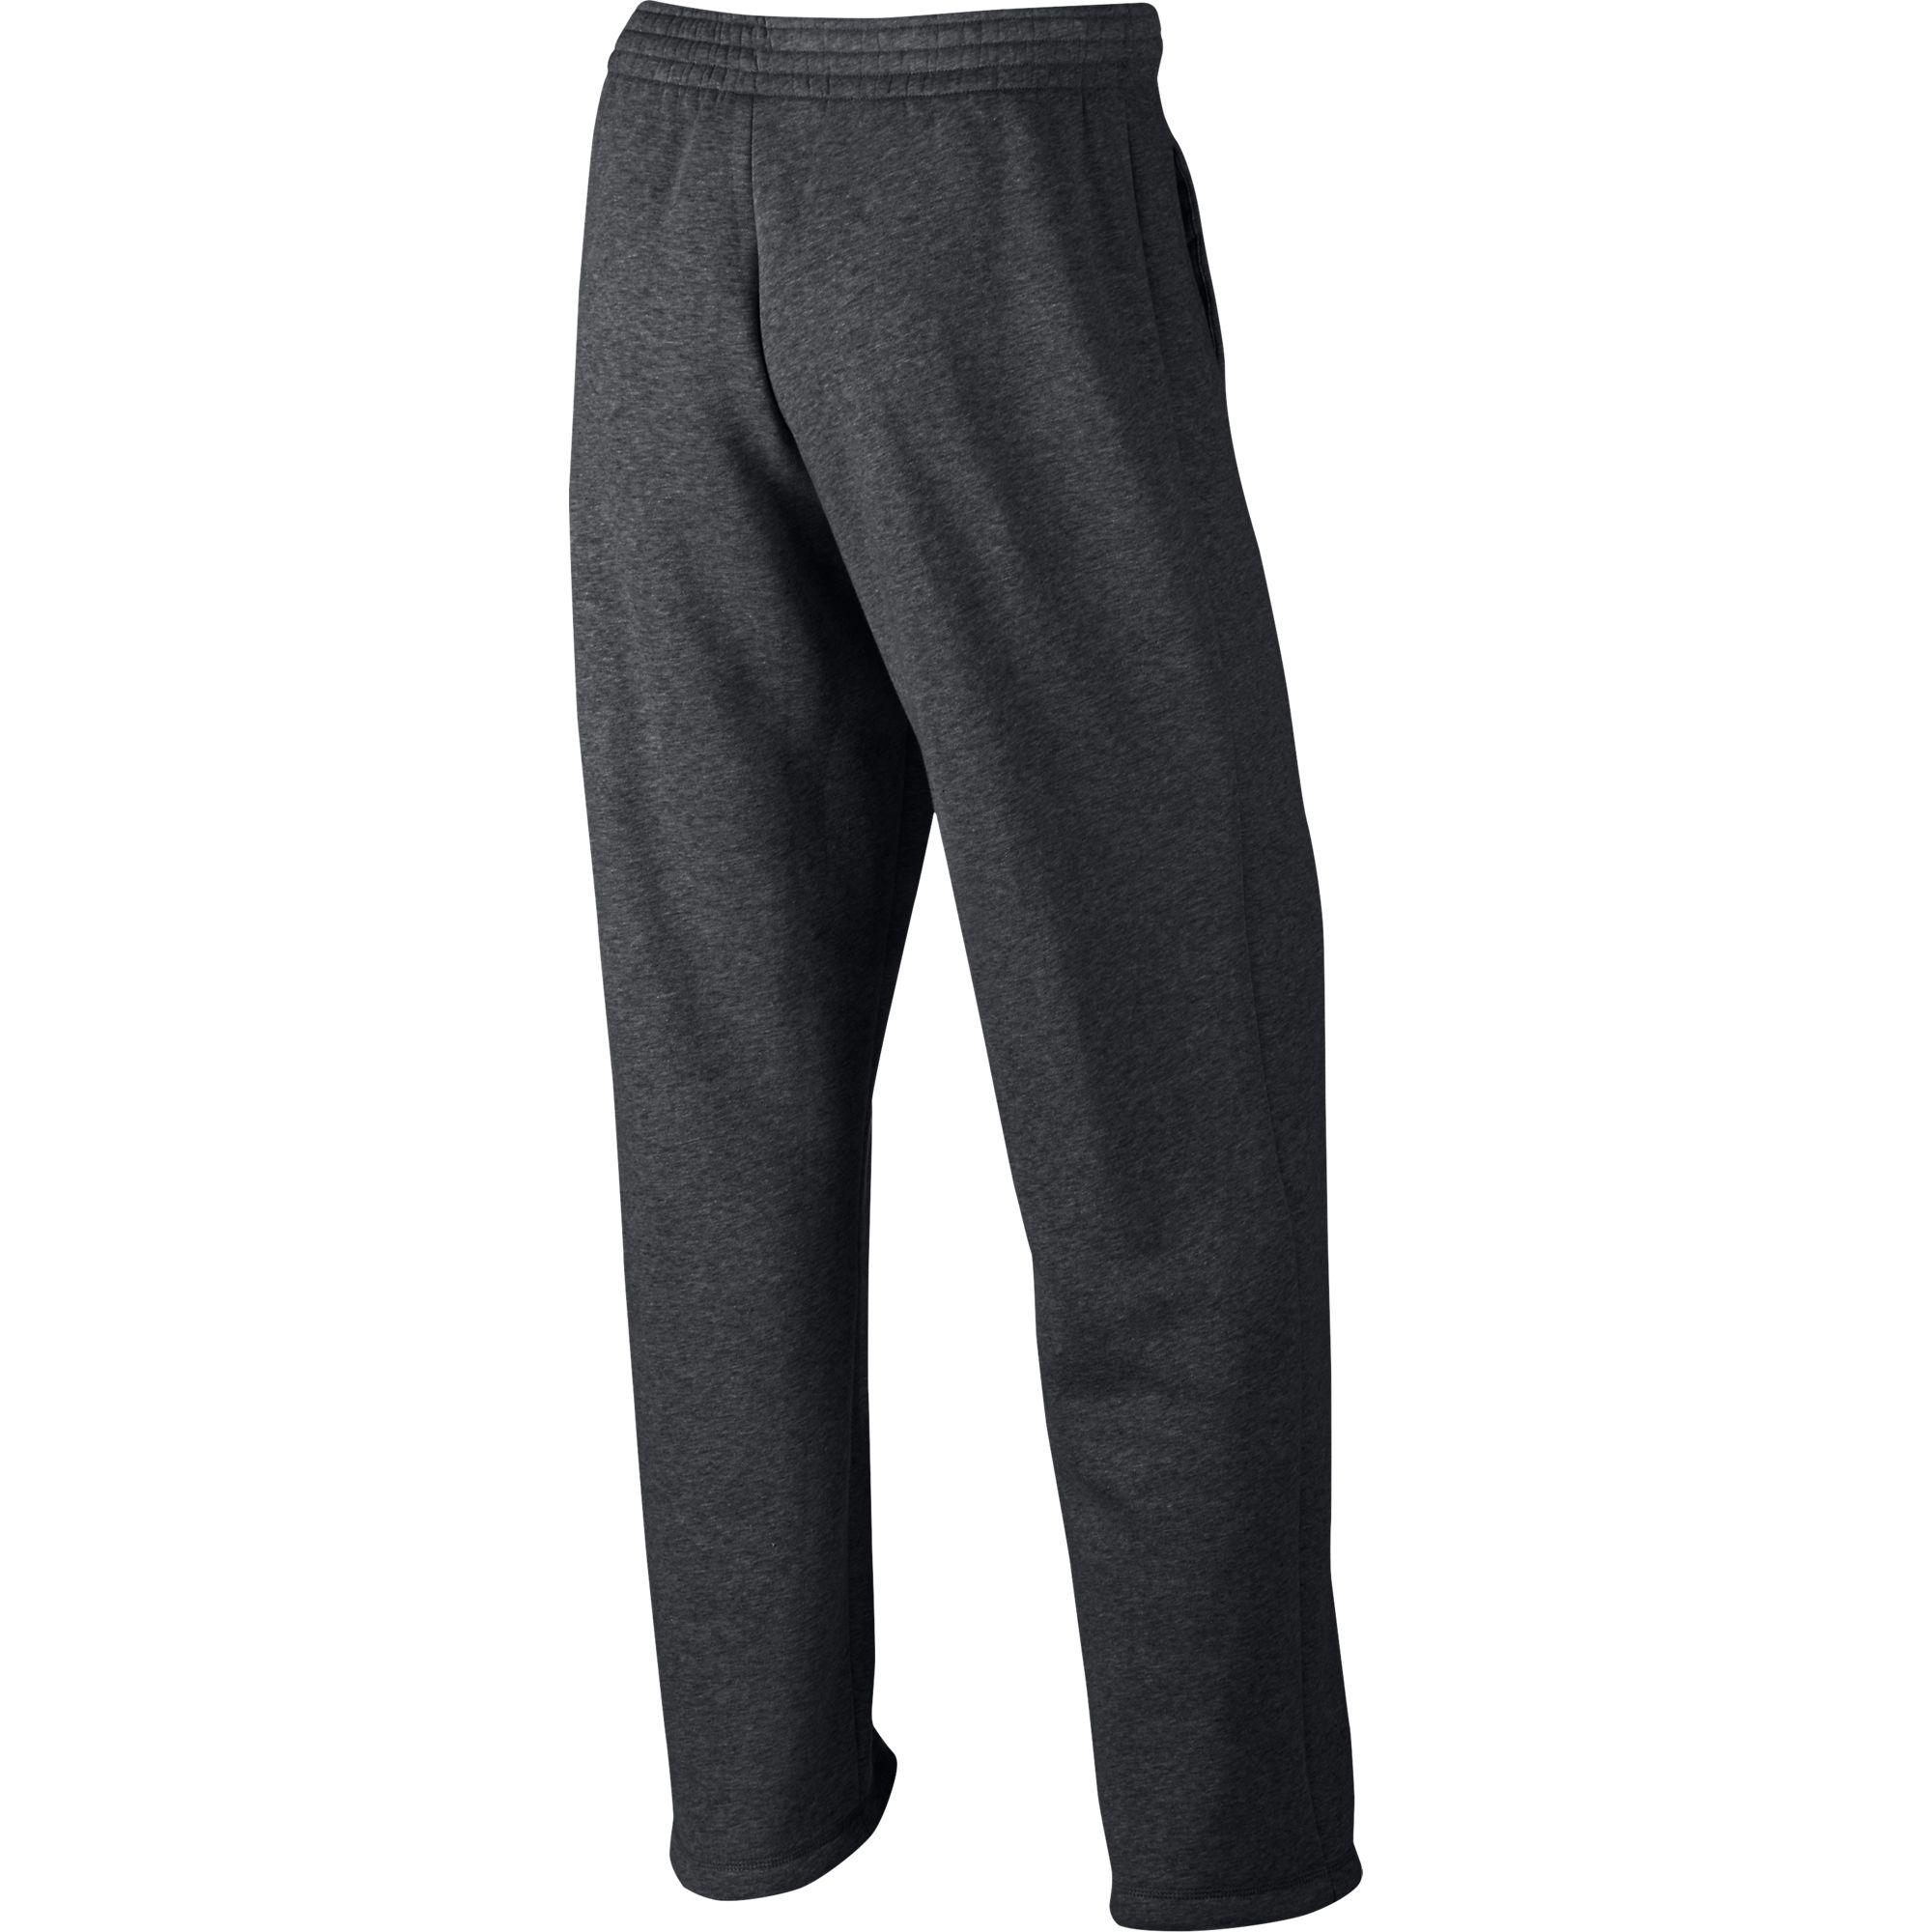 f5a3e98d22a0f4 Details about Jordan Flight Fleece Men s Open Hem Pants Grey Heather White  823073-071